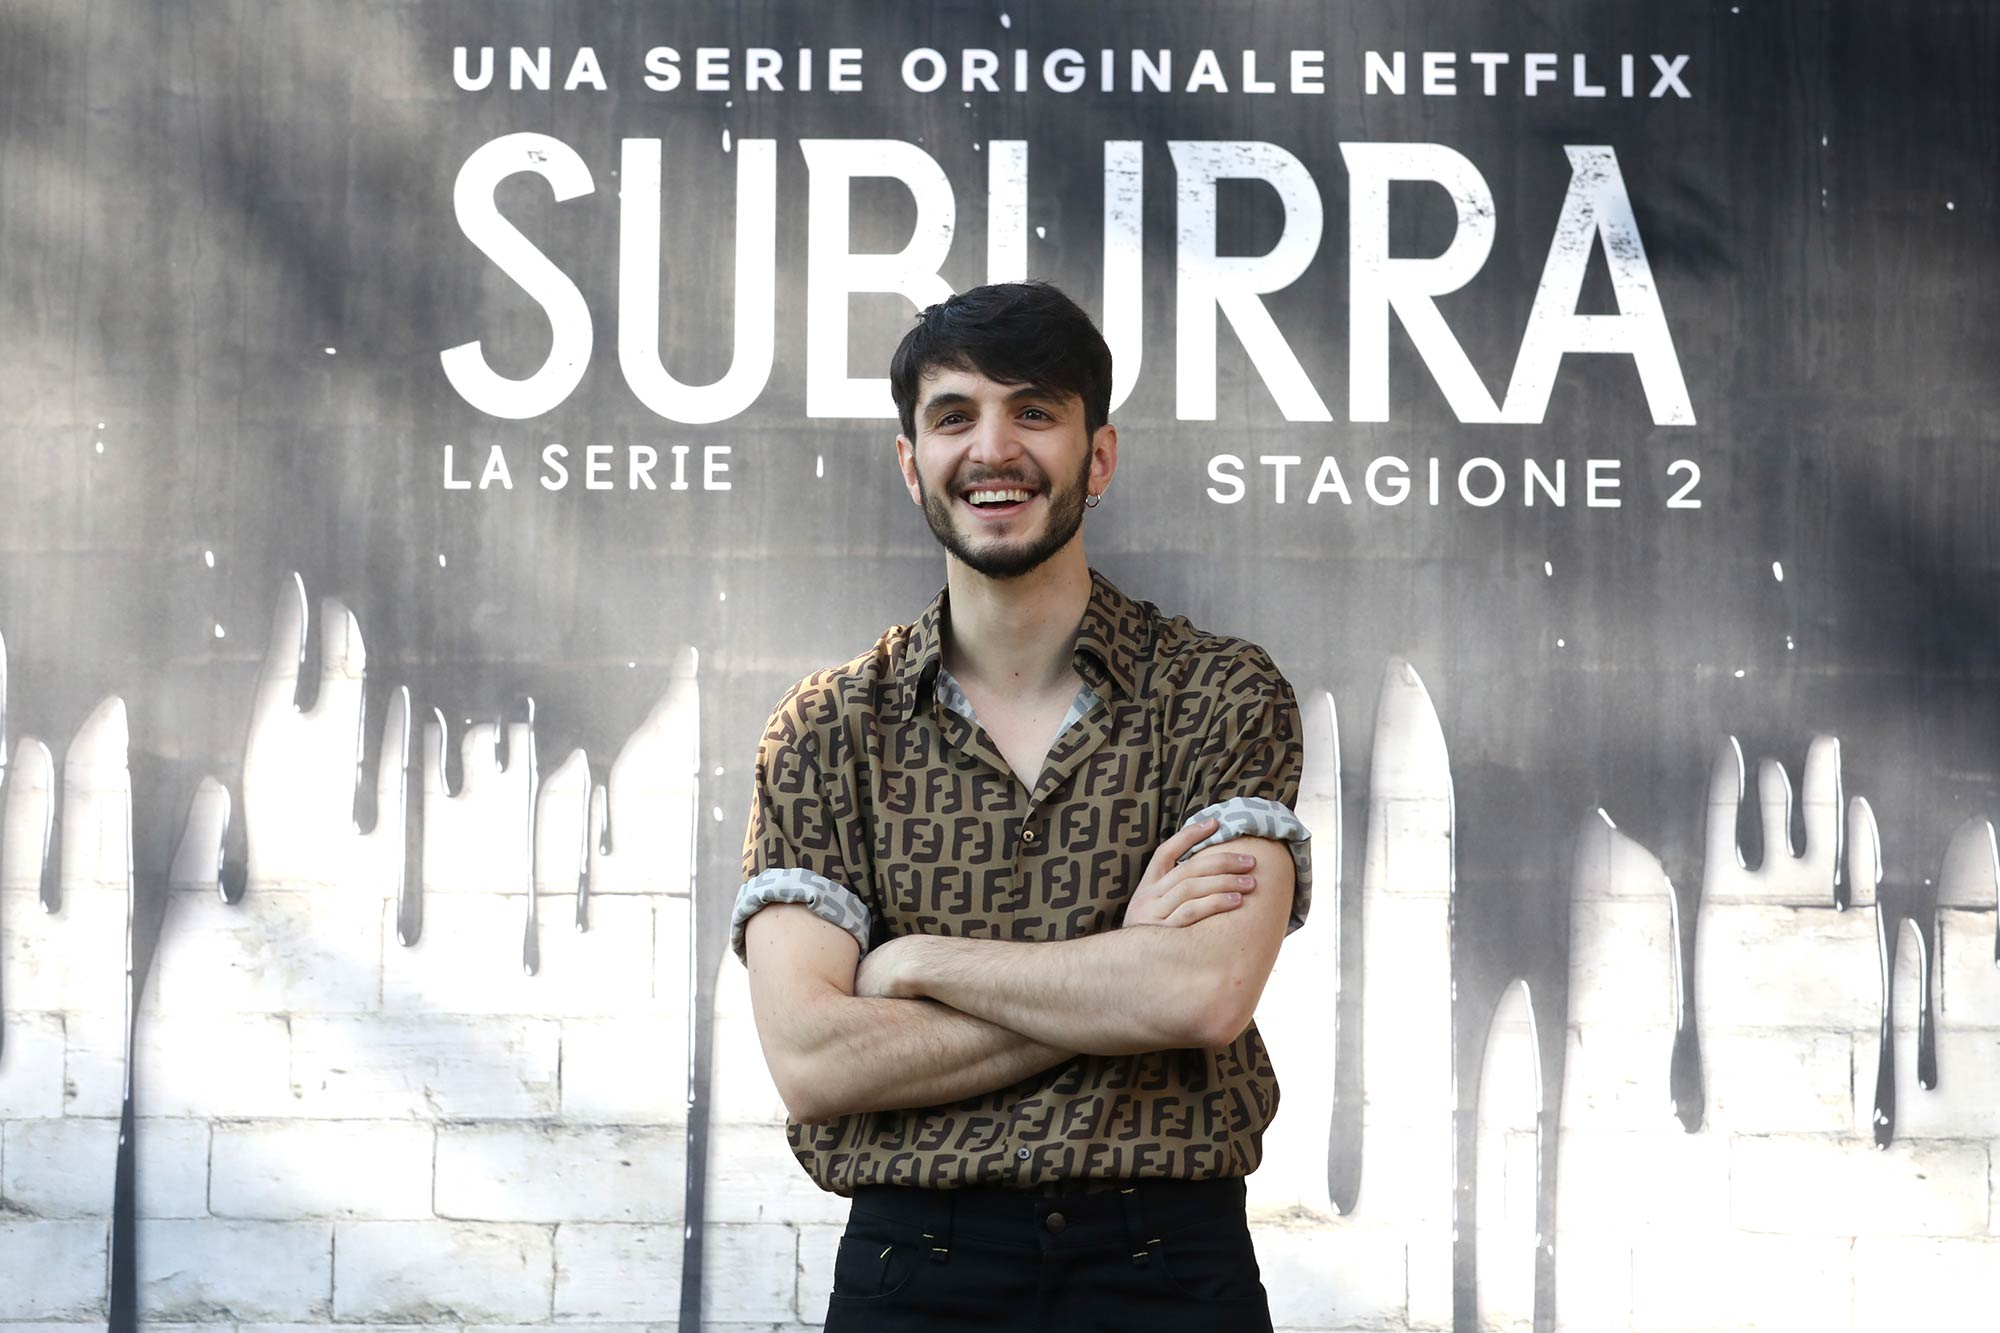 Netflix Premiere Suburra 2 - Giacomo Ferrara - Grooming Massimo Serini Team